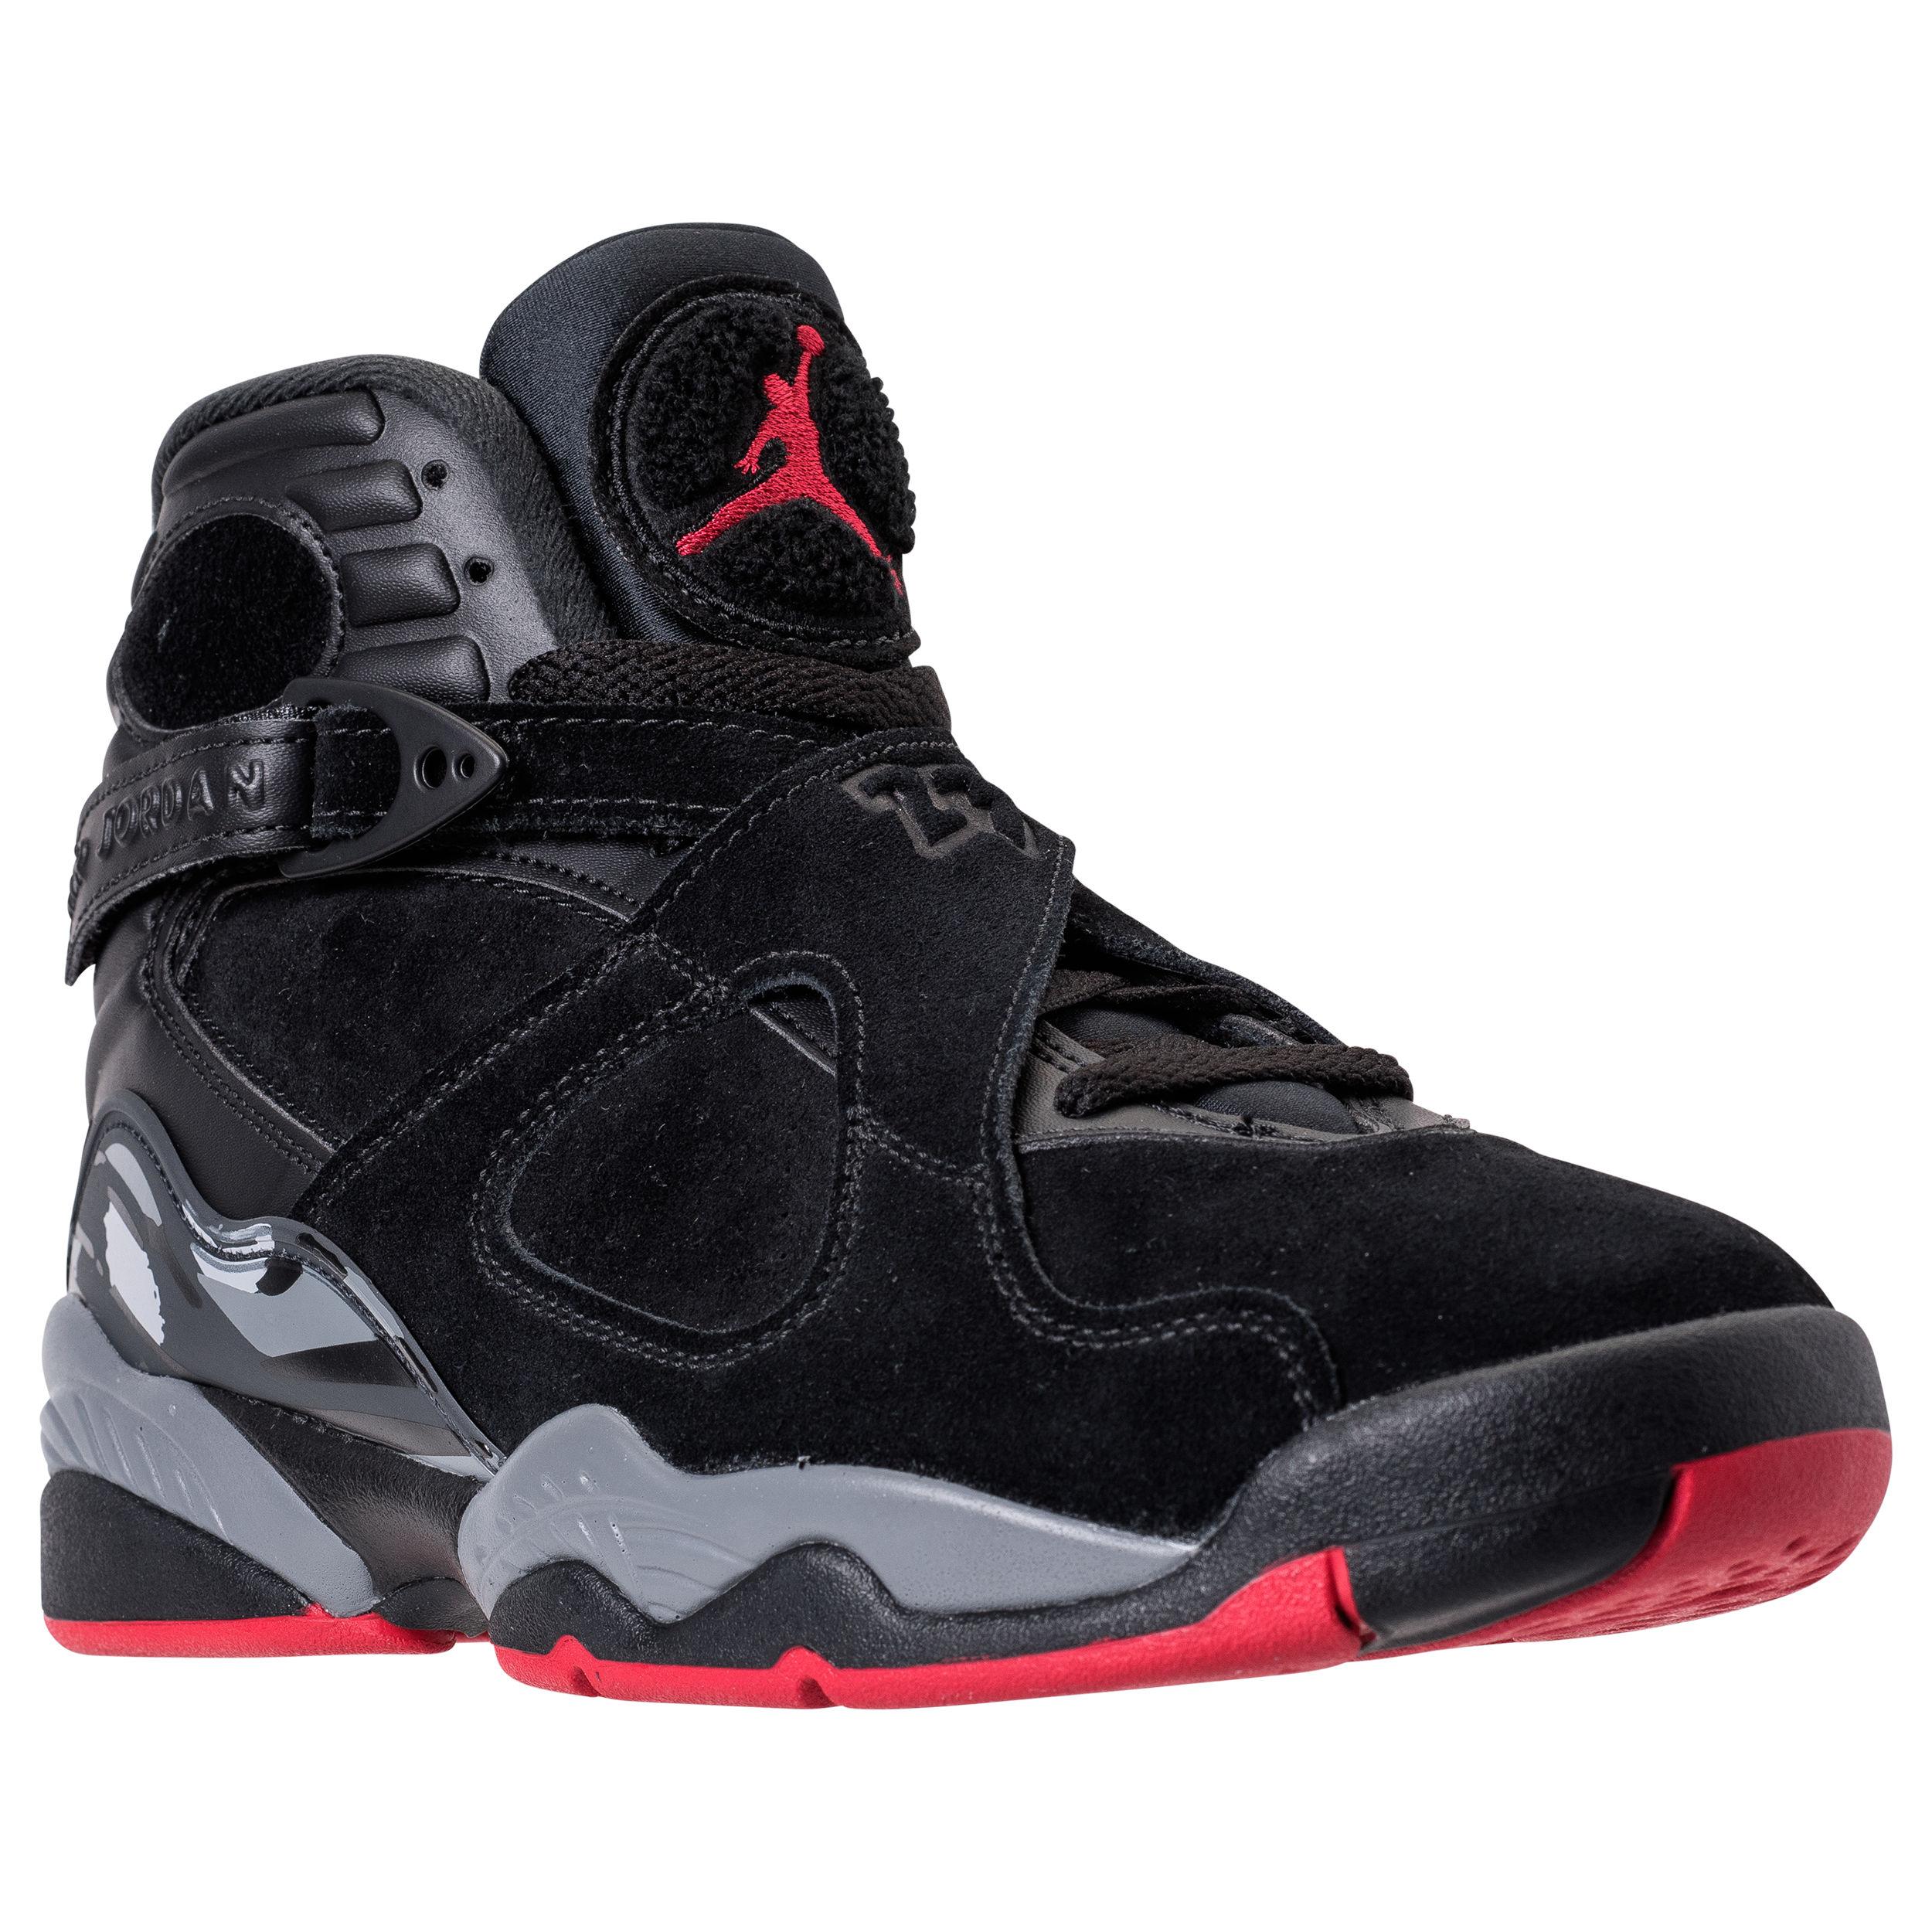 86c340446874 Basketball   Jordan Brand   Kicks On Court   Retro Lifestyle ...